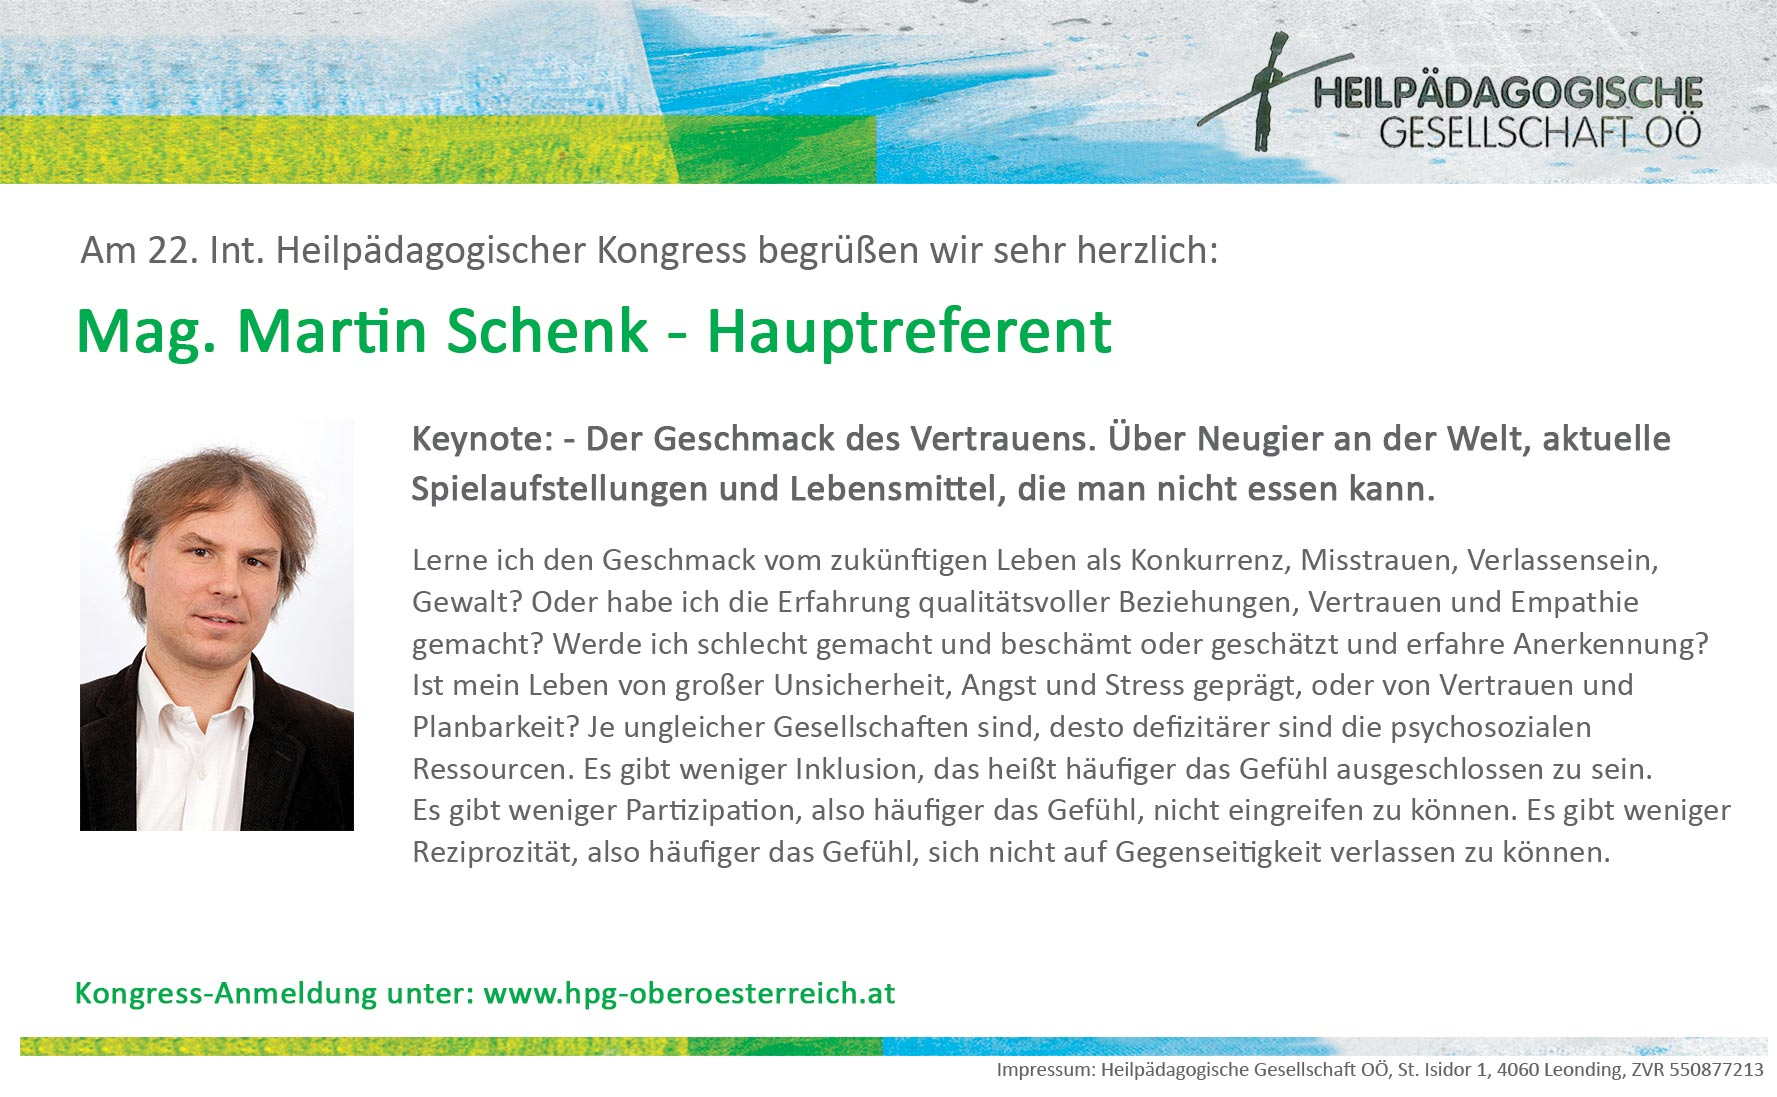 Joachim Bauer - Hauptreferent